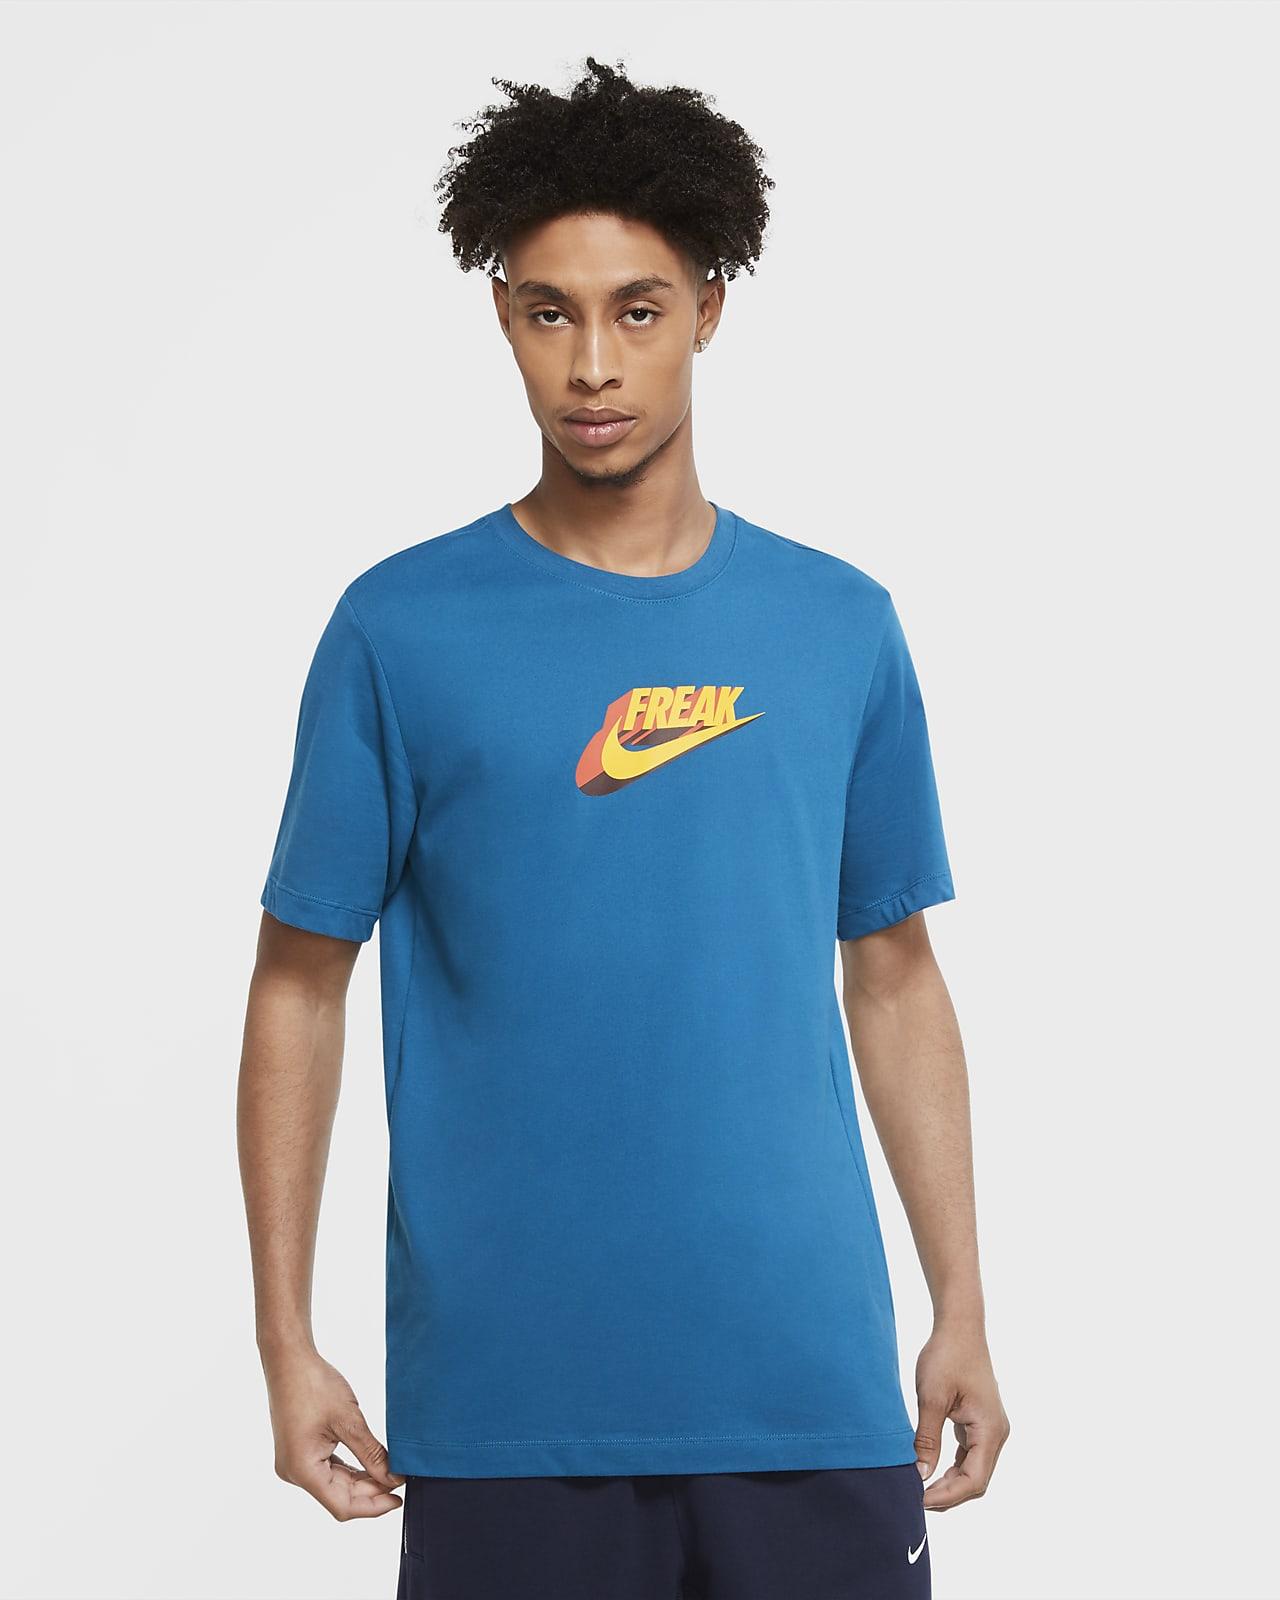 Giannis Swoosh Freak Men's Nike Dri-FIT T-Shirt